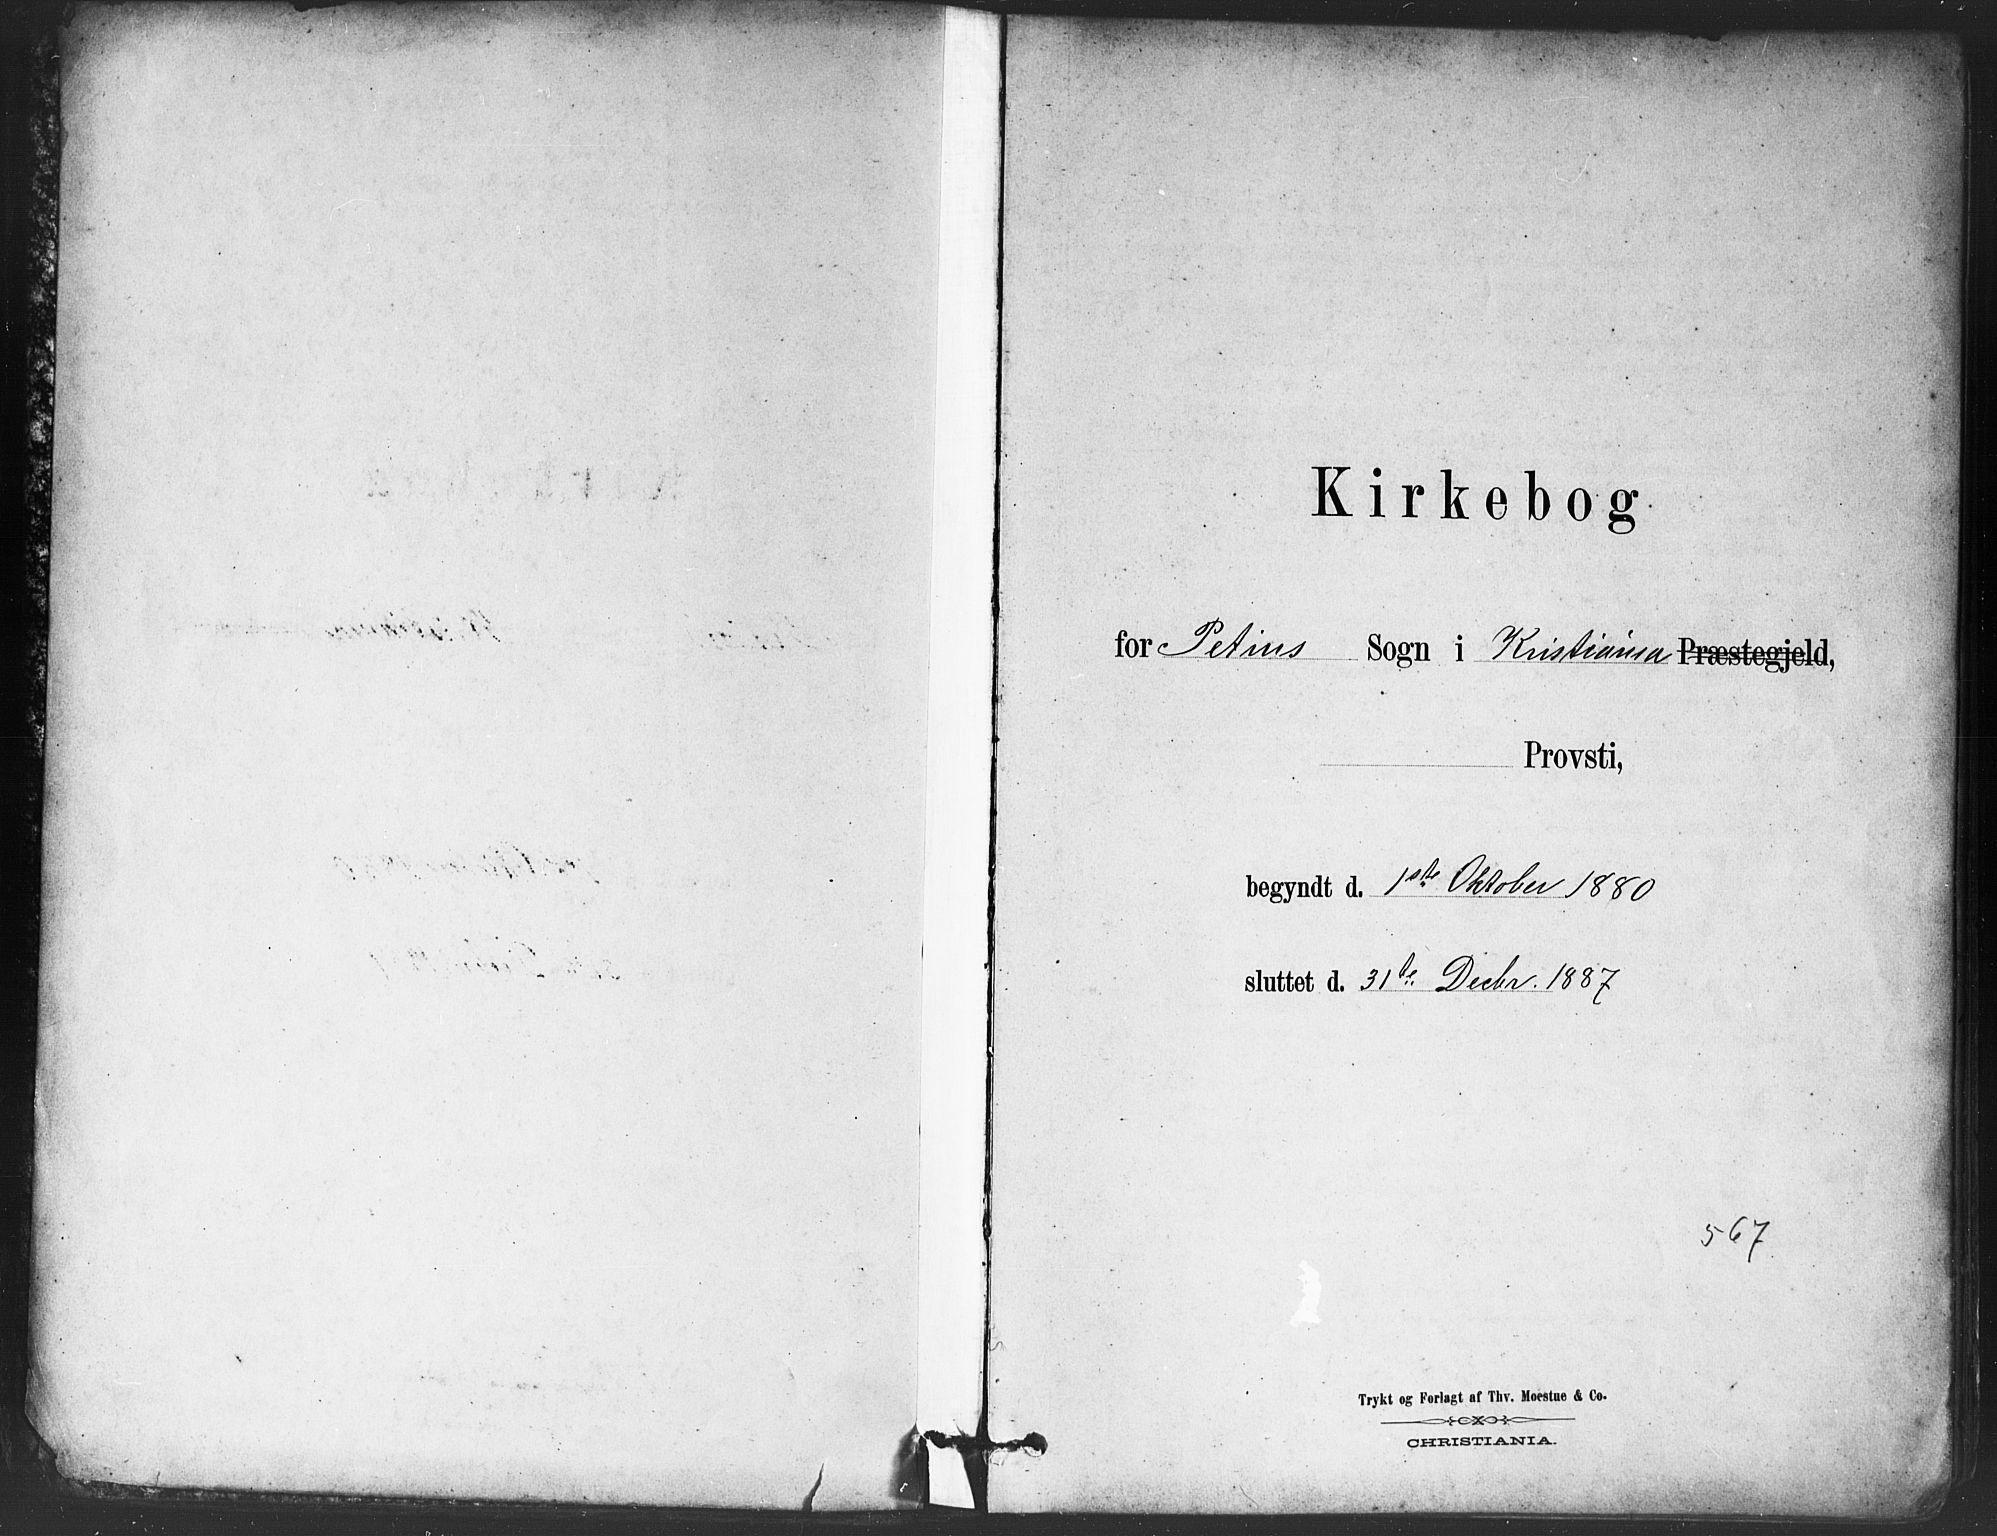 SAO, Petrus prestekontor Kirkebøker, G/Ga/L0001: Klokkerbok nr. 1, 1880-1887